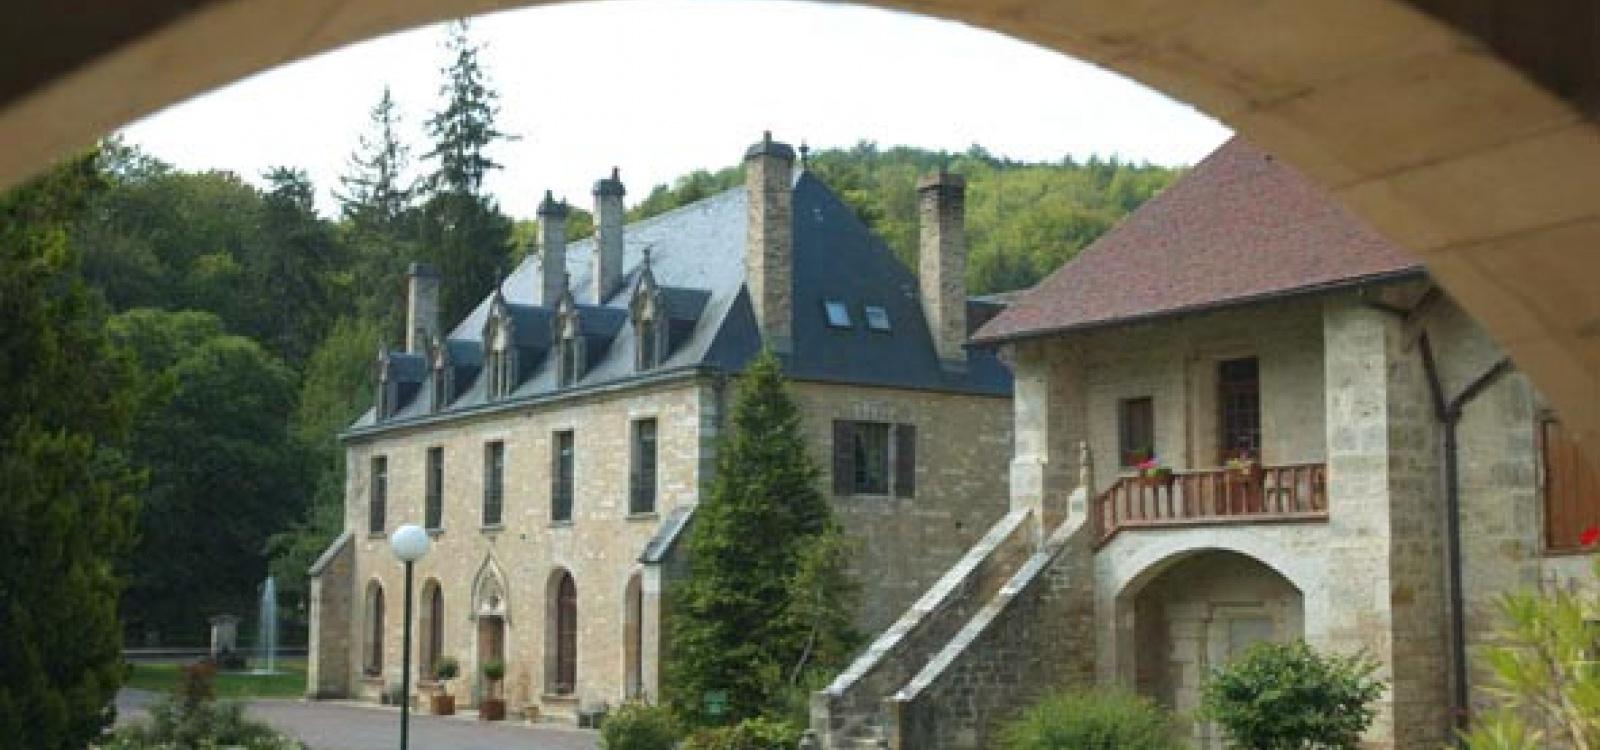 Dijon,France,4 BathroomsBathrooms,Hôtellerie,1005